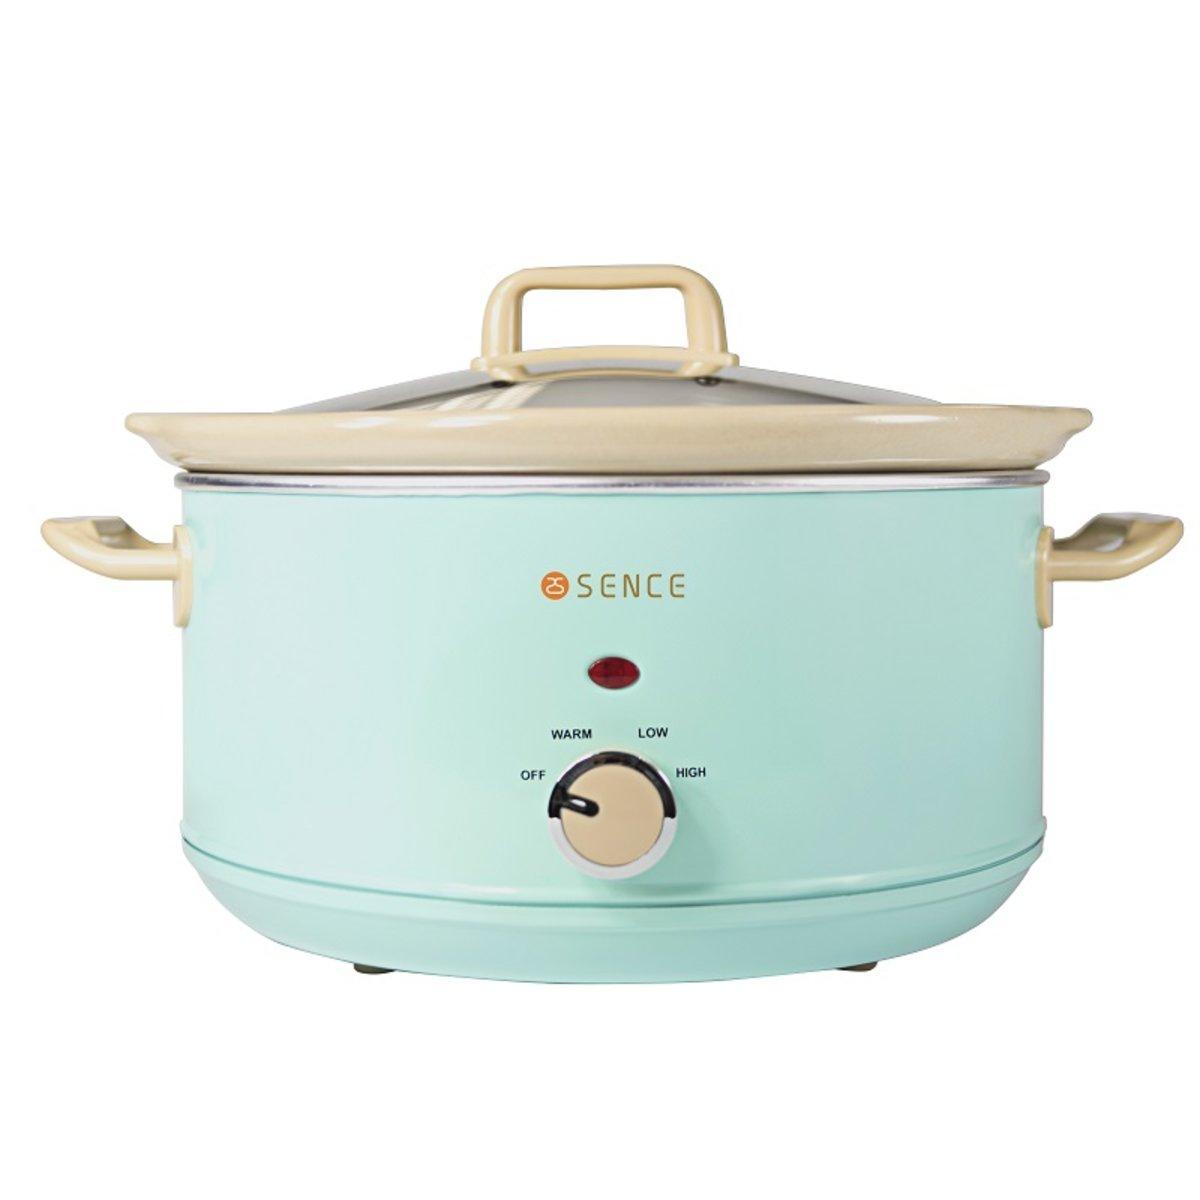 Slow cooker (4.5L)[Display Item]